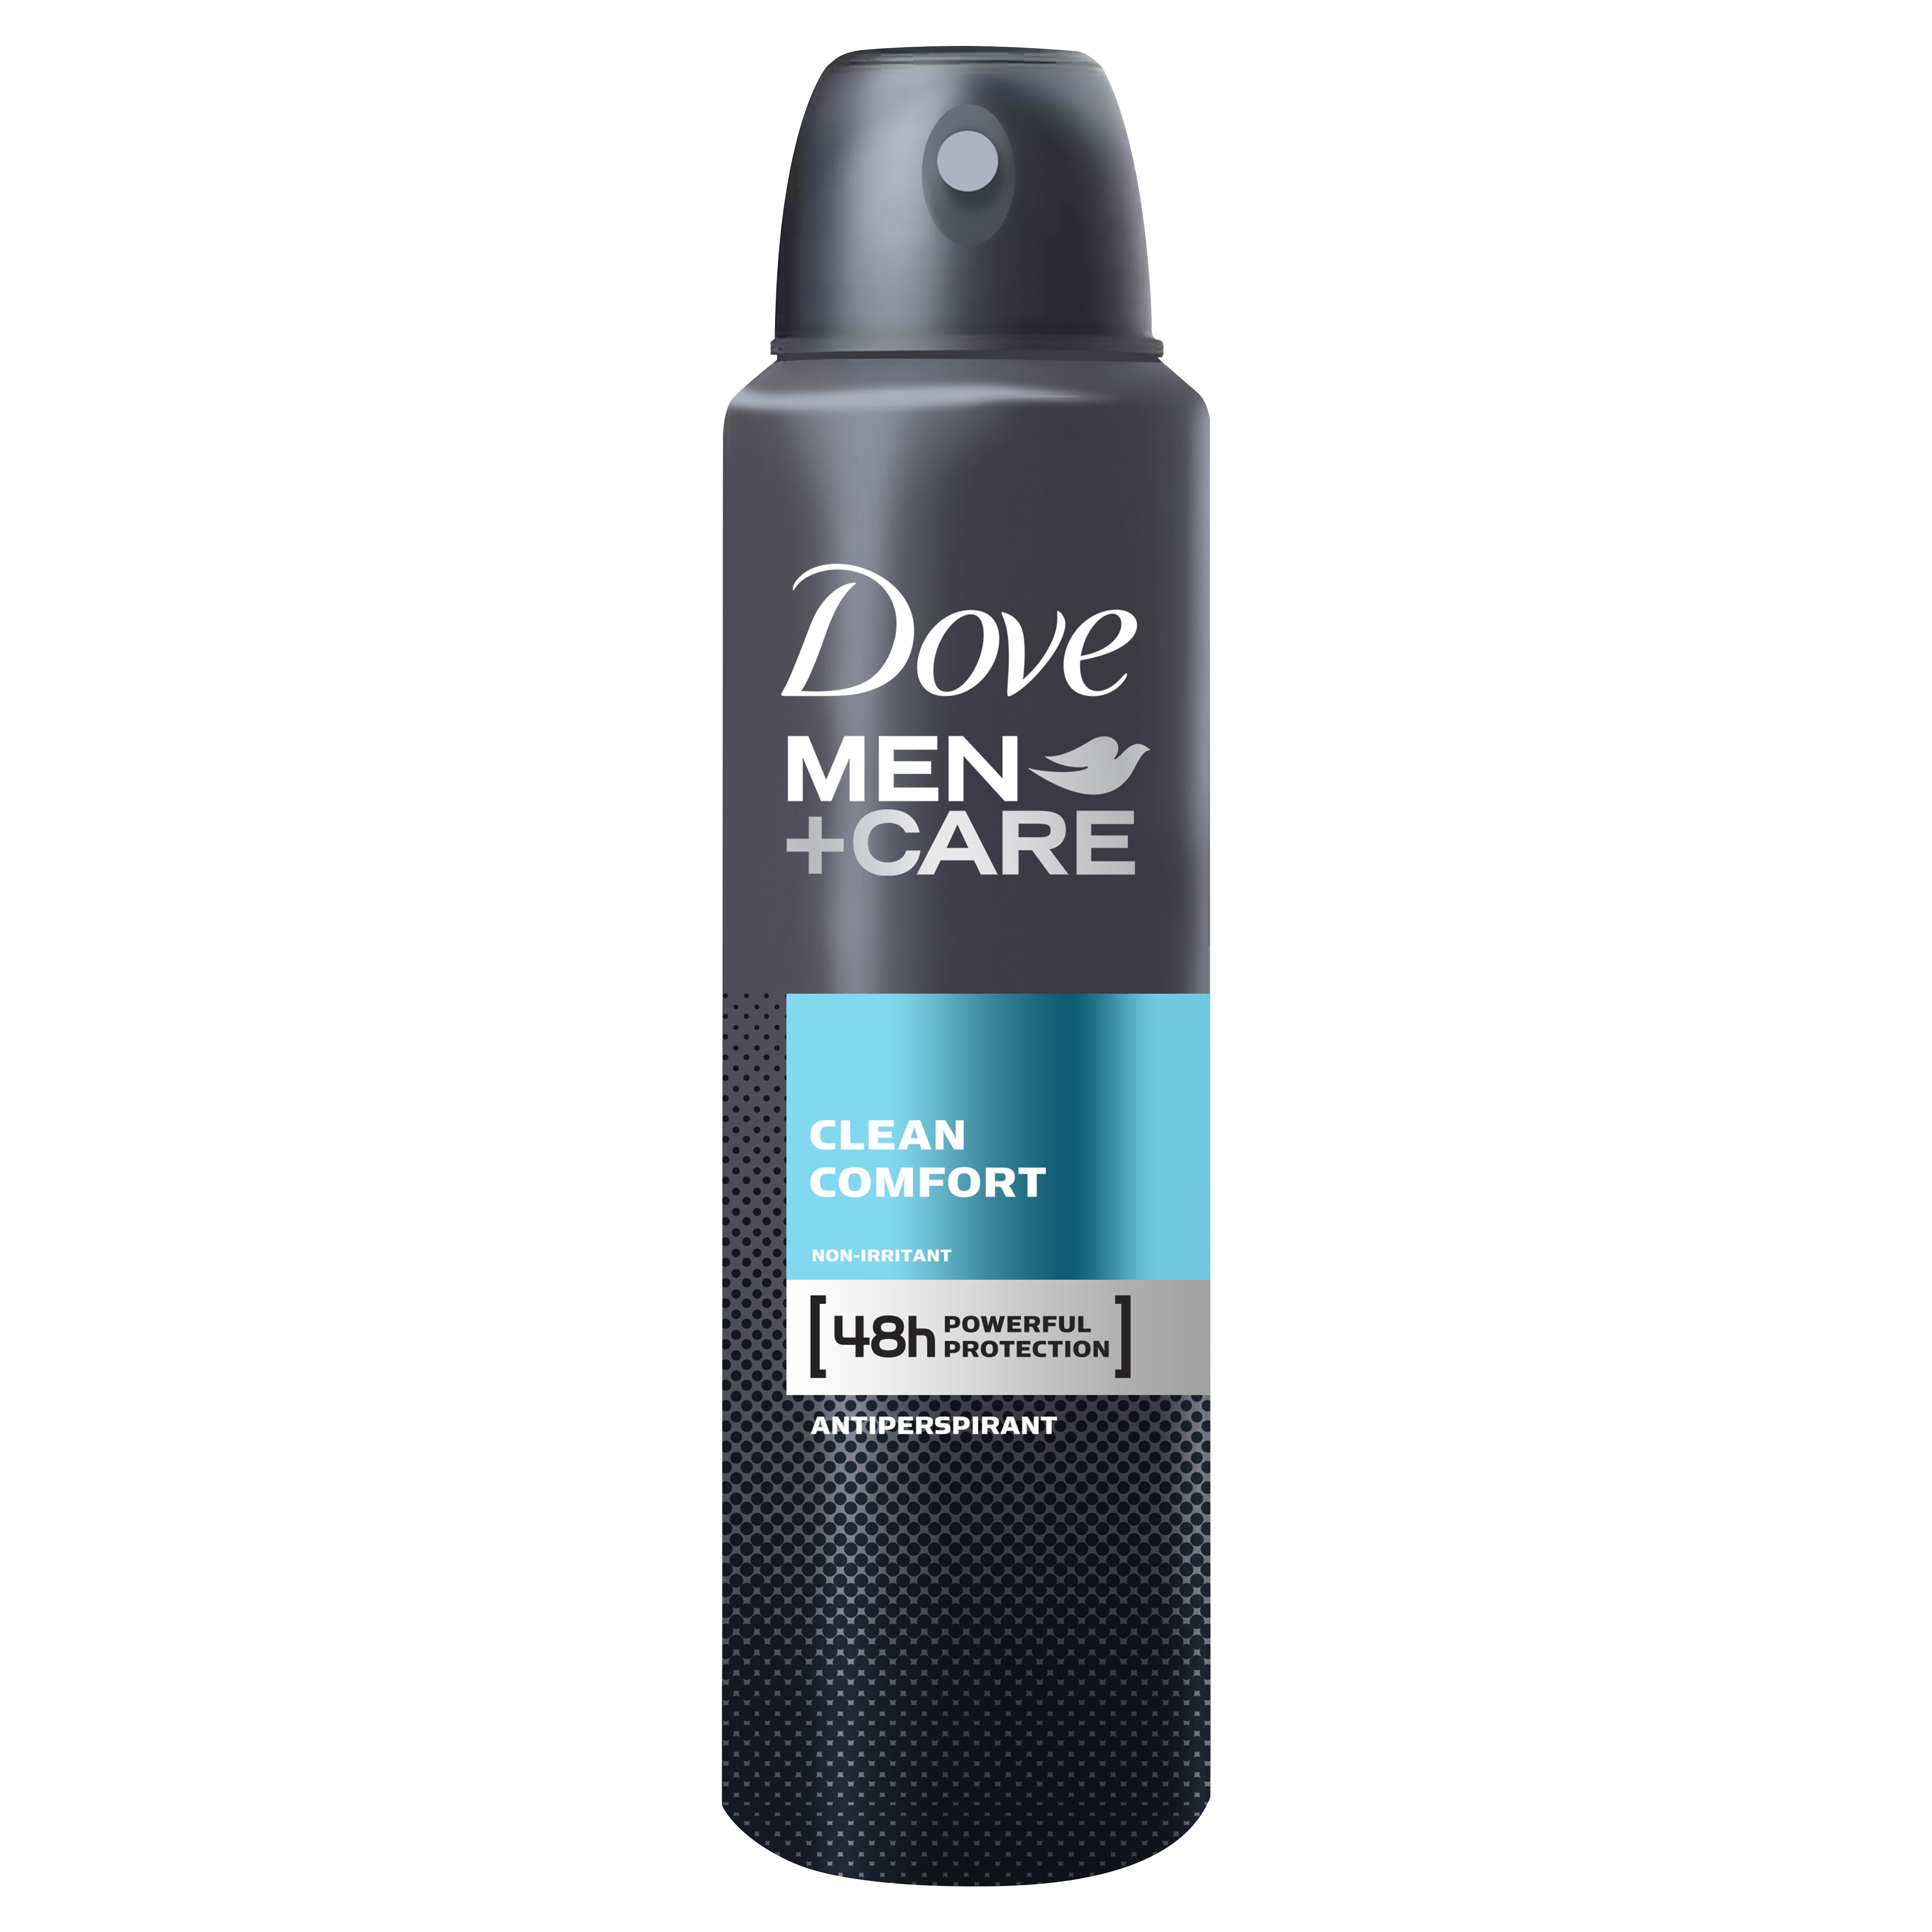 Men Care Clean Comfort Antiperspirant Deodorant Spray Dove